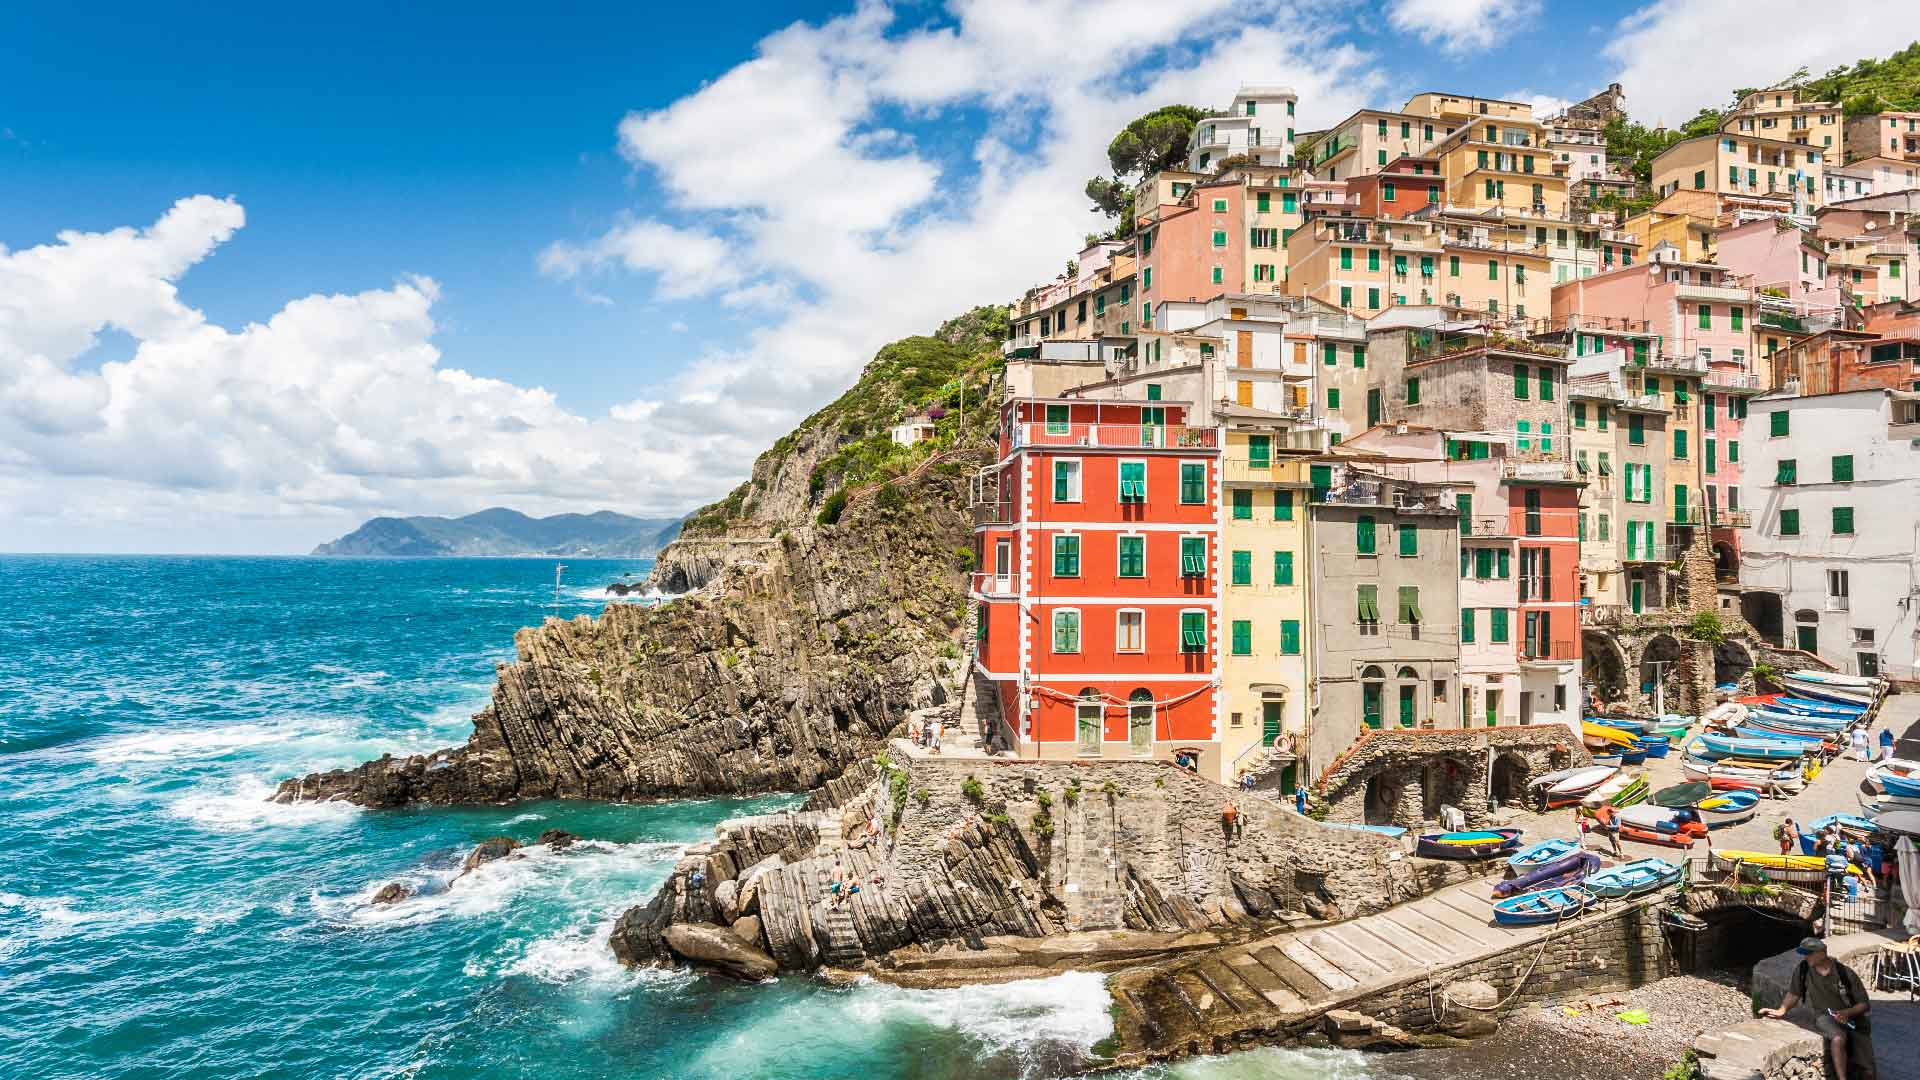 Riomaggiore, Residence La Frontiera, Cinque Terre